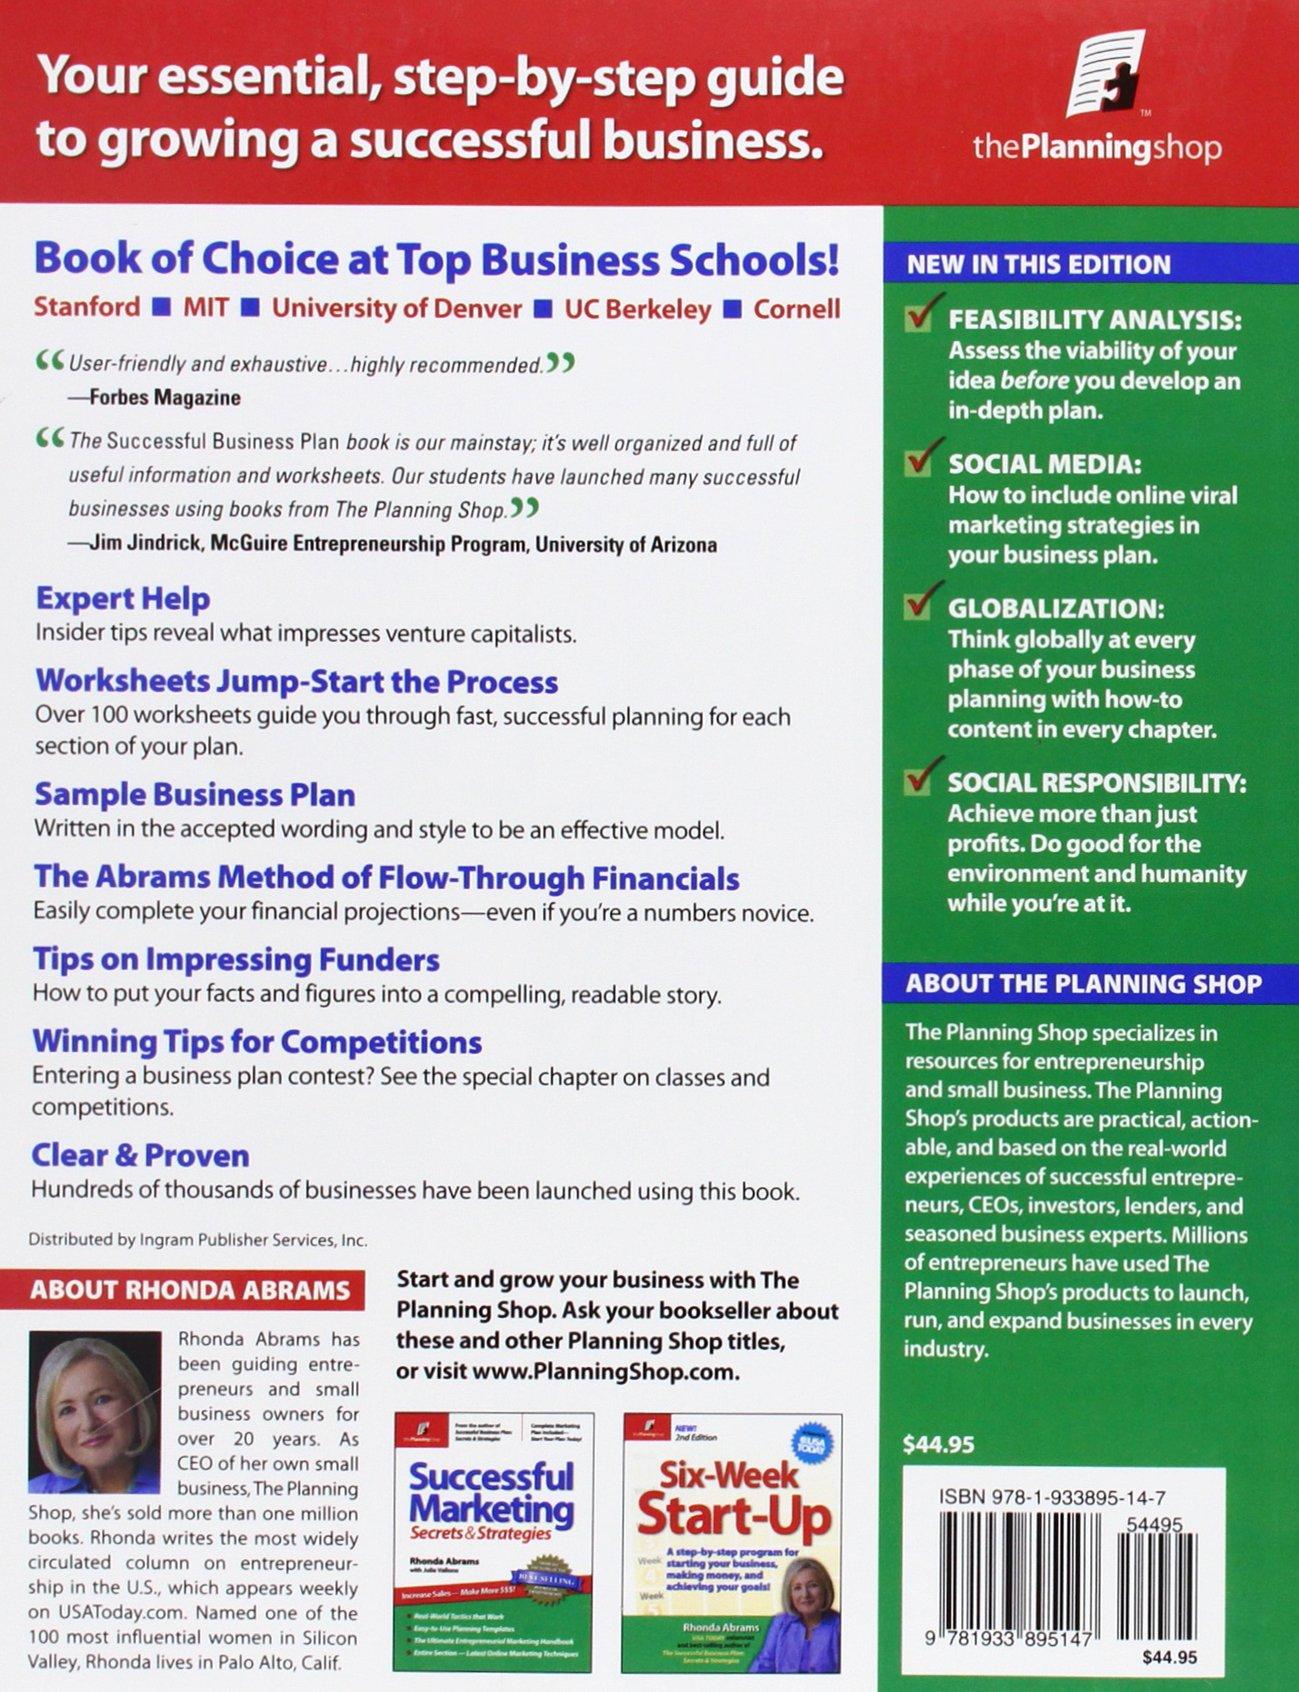 amazon com successful business plan secrets strategies amazon com successful business plan secrets strategies successful business plan secrets and strategies 9781933895147 rhonda abrams